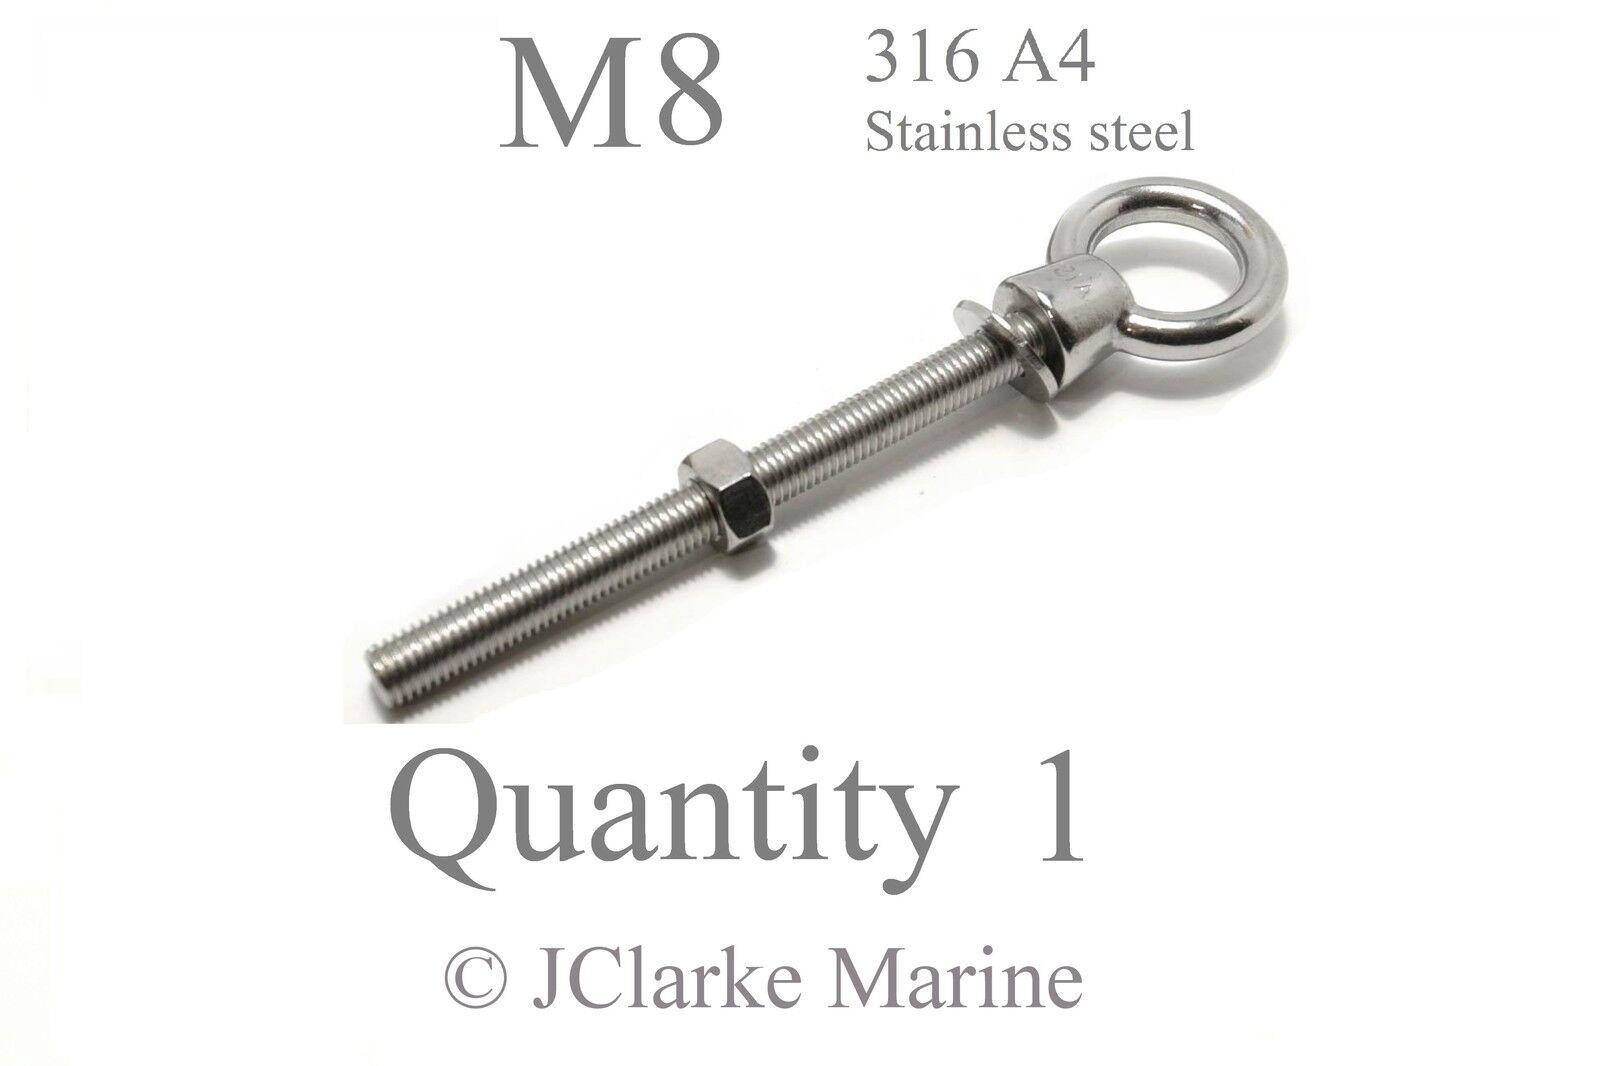 M12 x 120mm A4 316 Marine Grade Stainless Steel Lifting Eye Bolt Longshank Nut